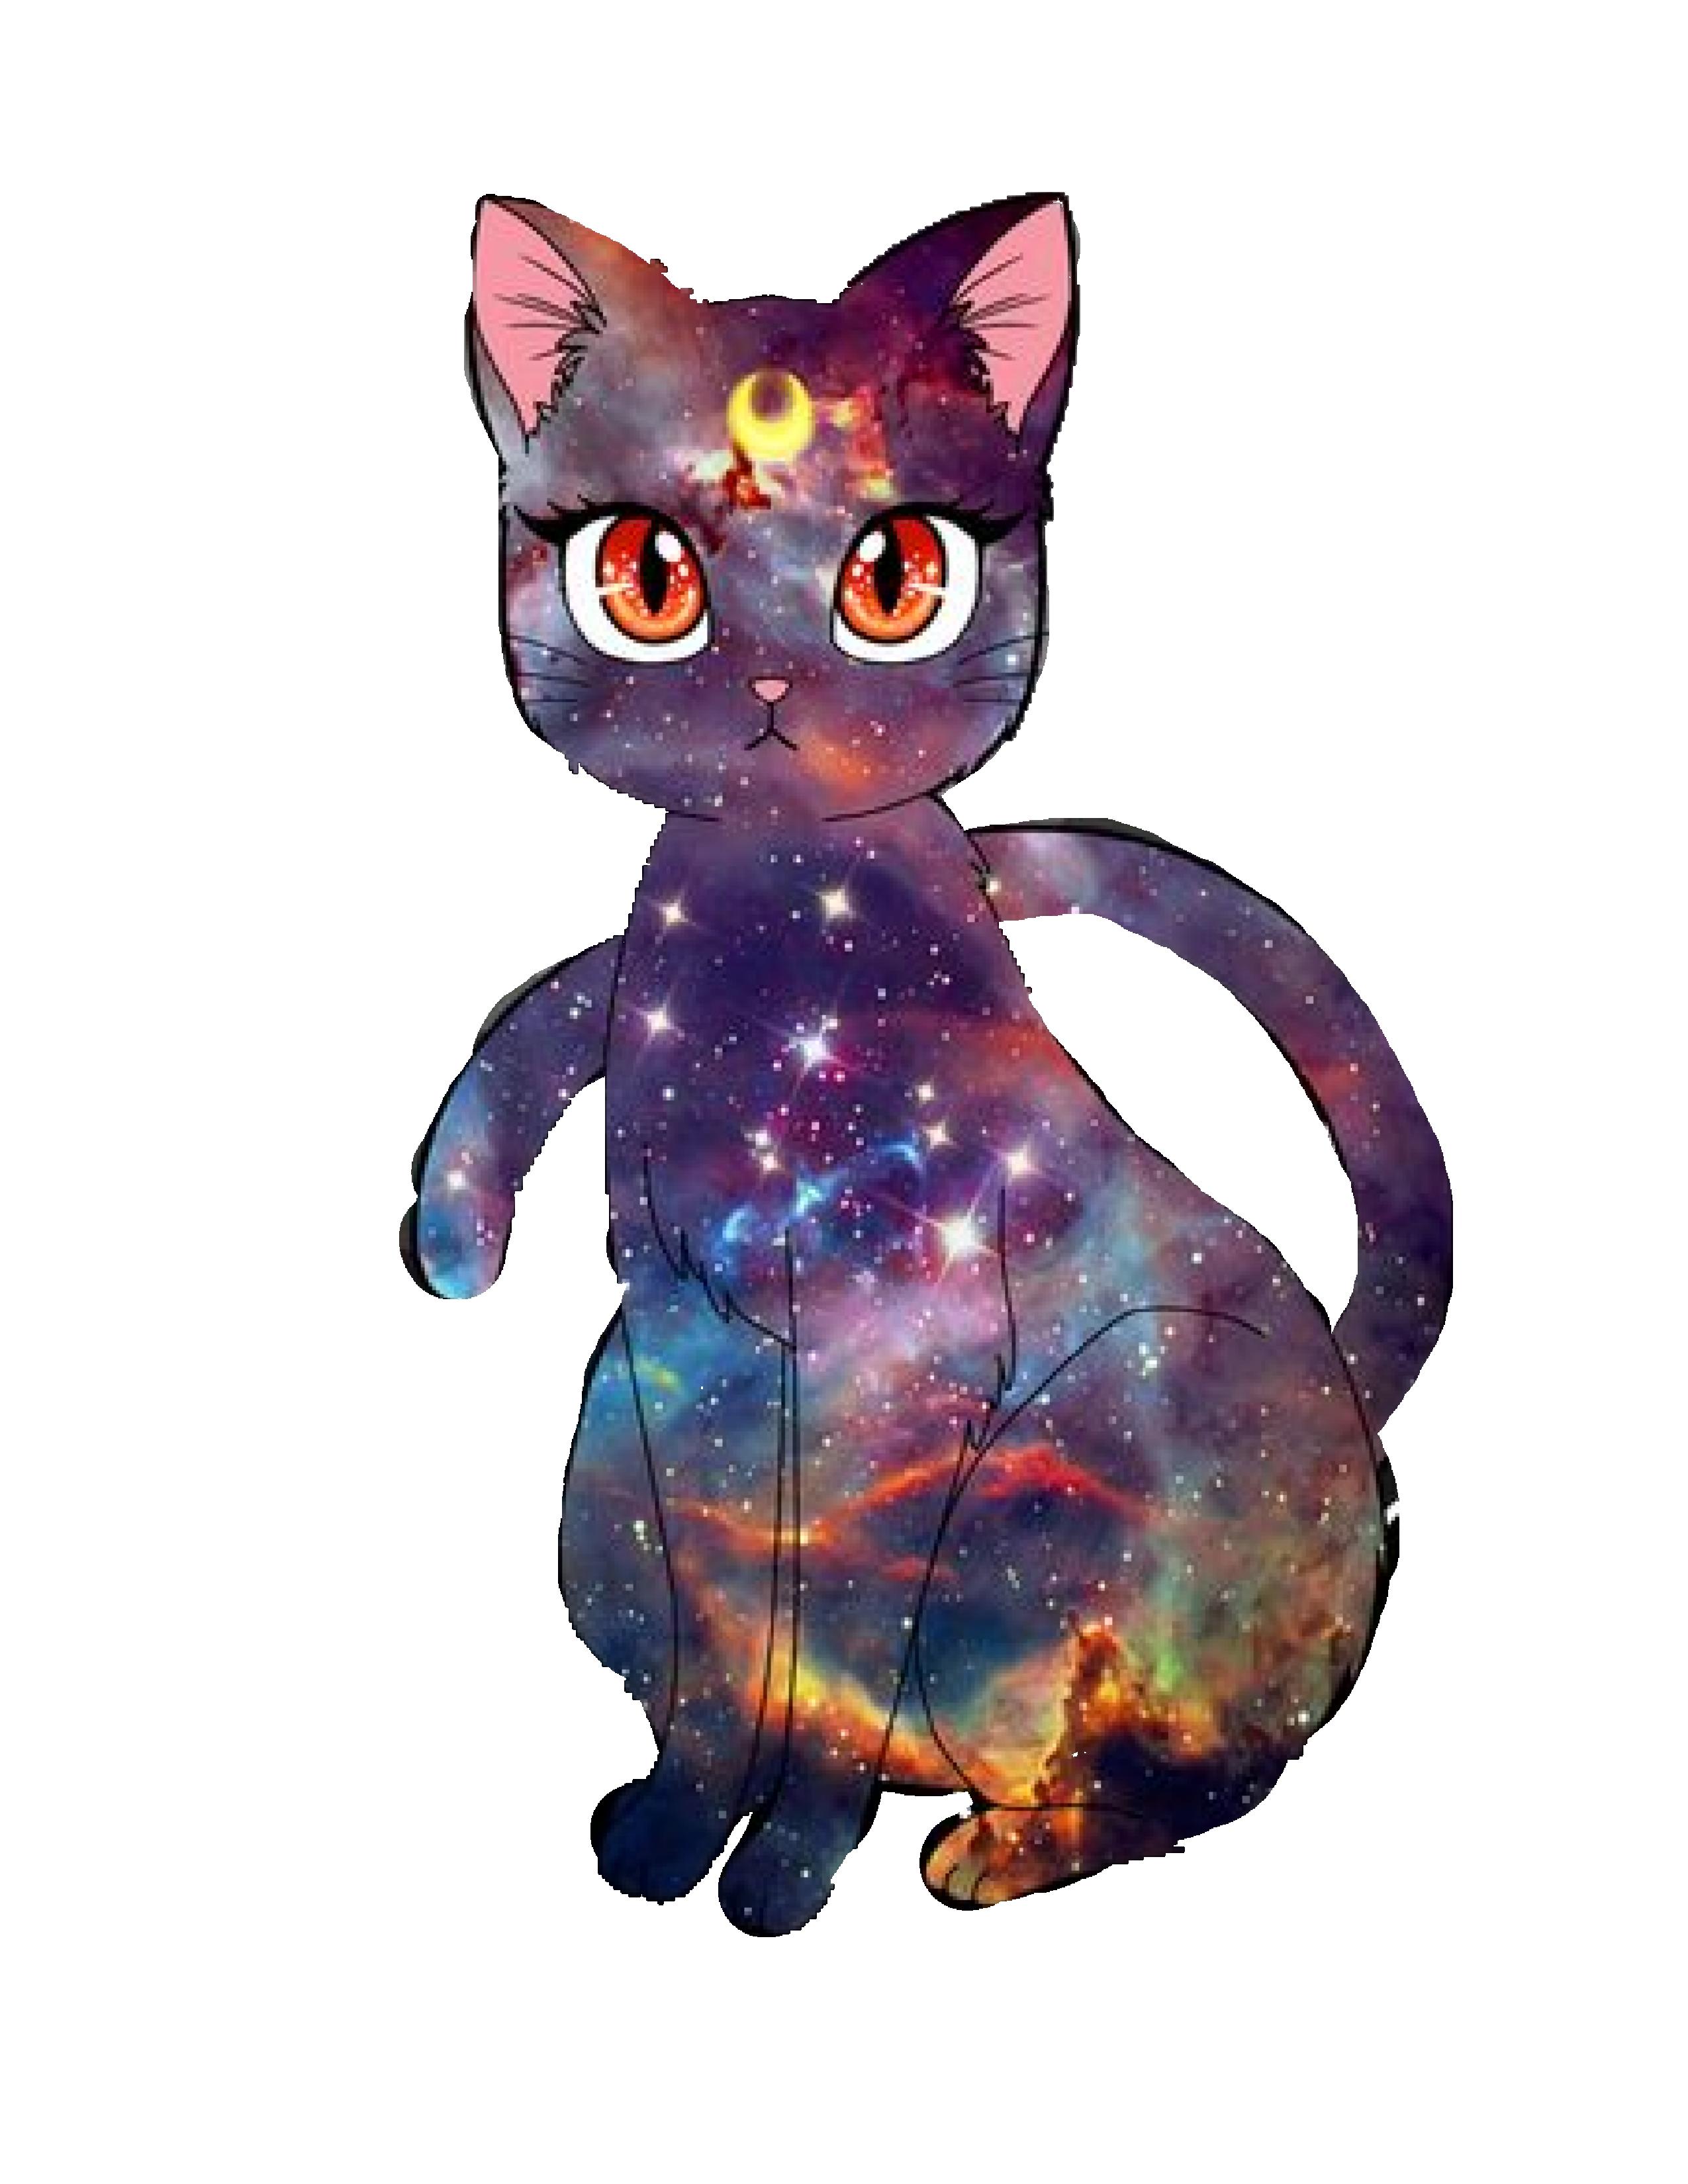 2550x3300 Chocolatejuju, Super Cute Sailor Moon Vector Art! Made For A